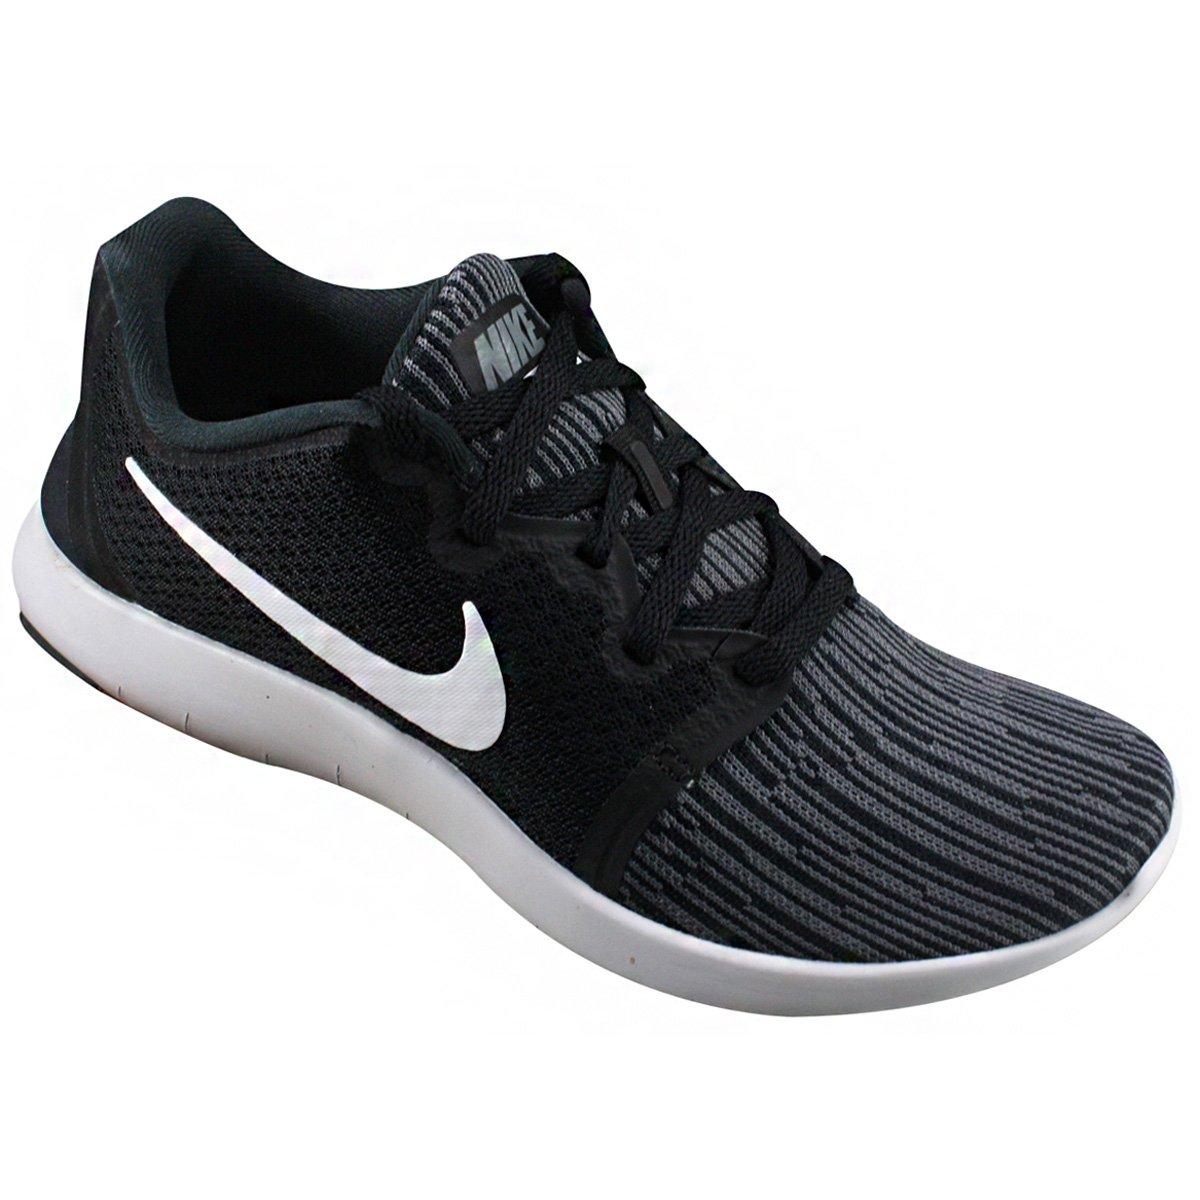 7275cbdb88 Tênis Feminino Nike Flex Contact 2 AA7409-010 - Preto Branco ...